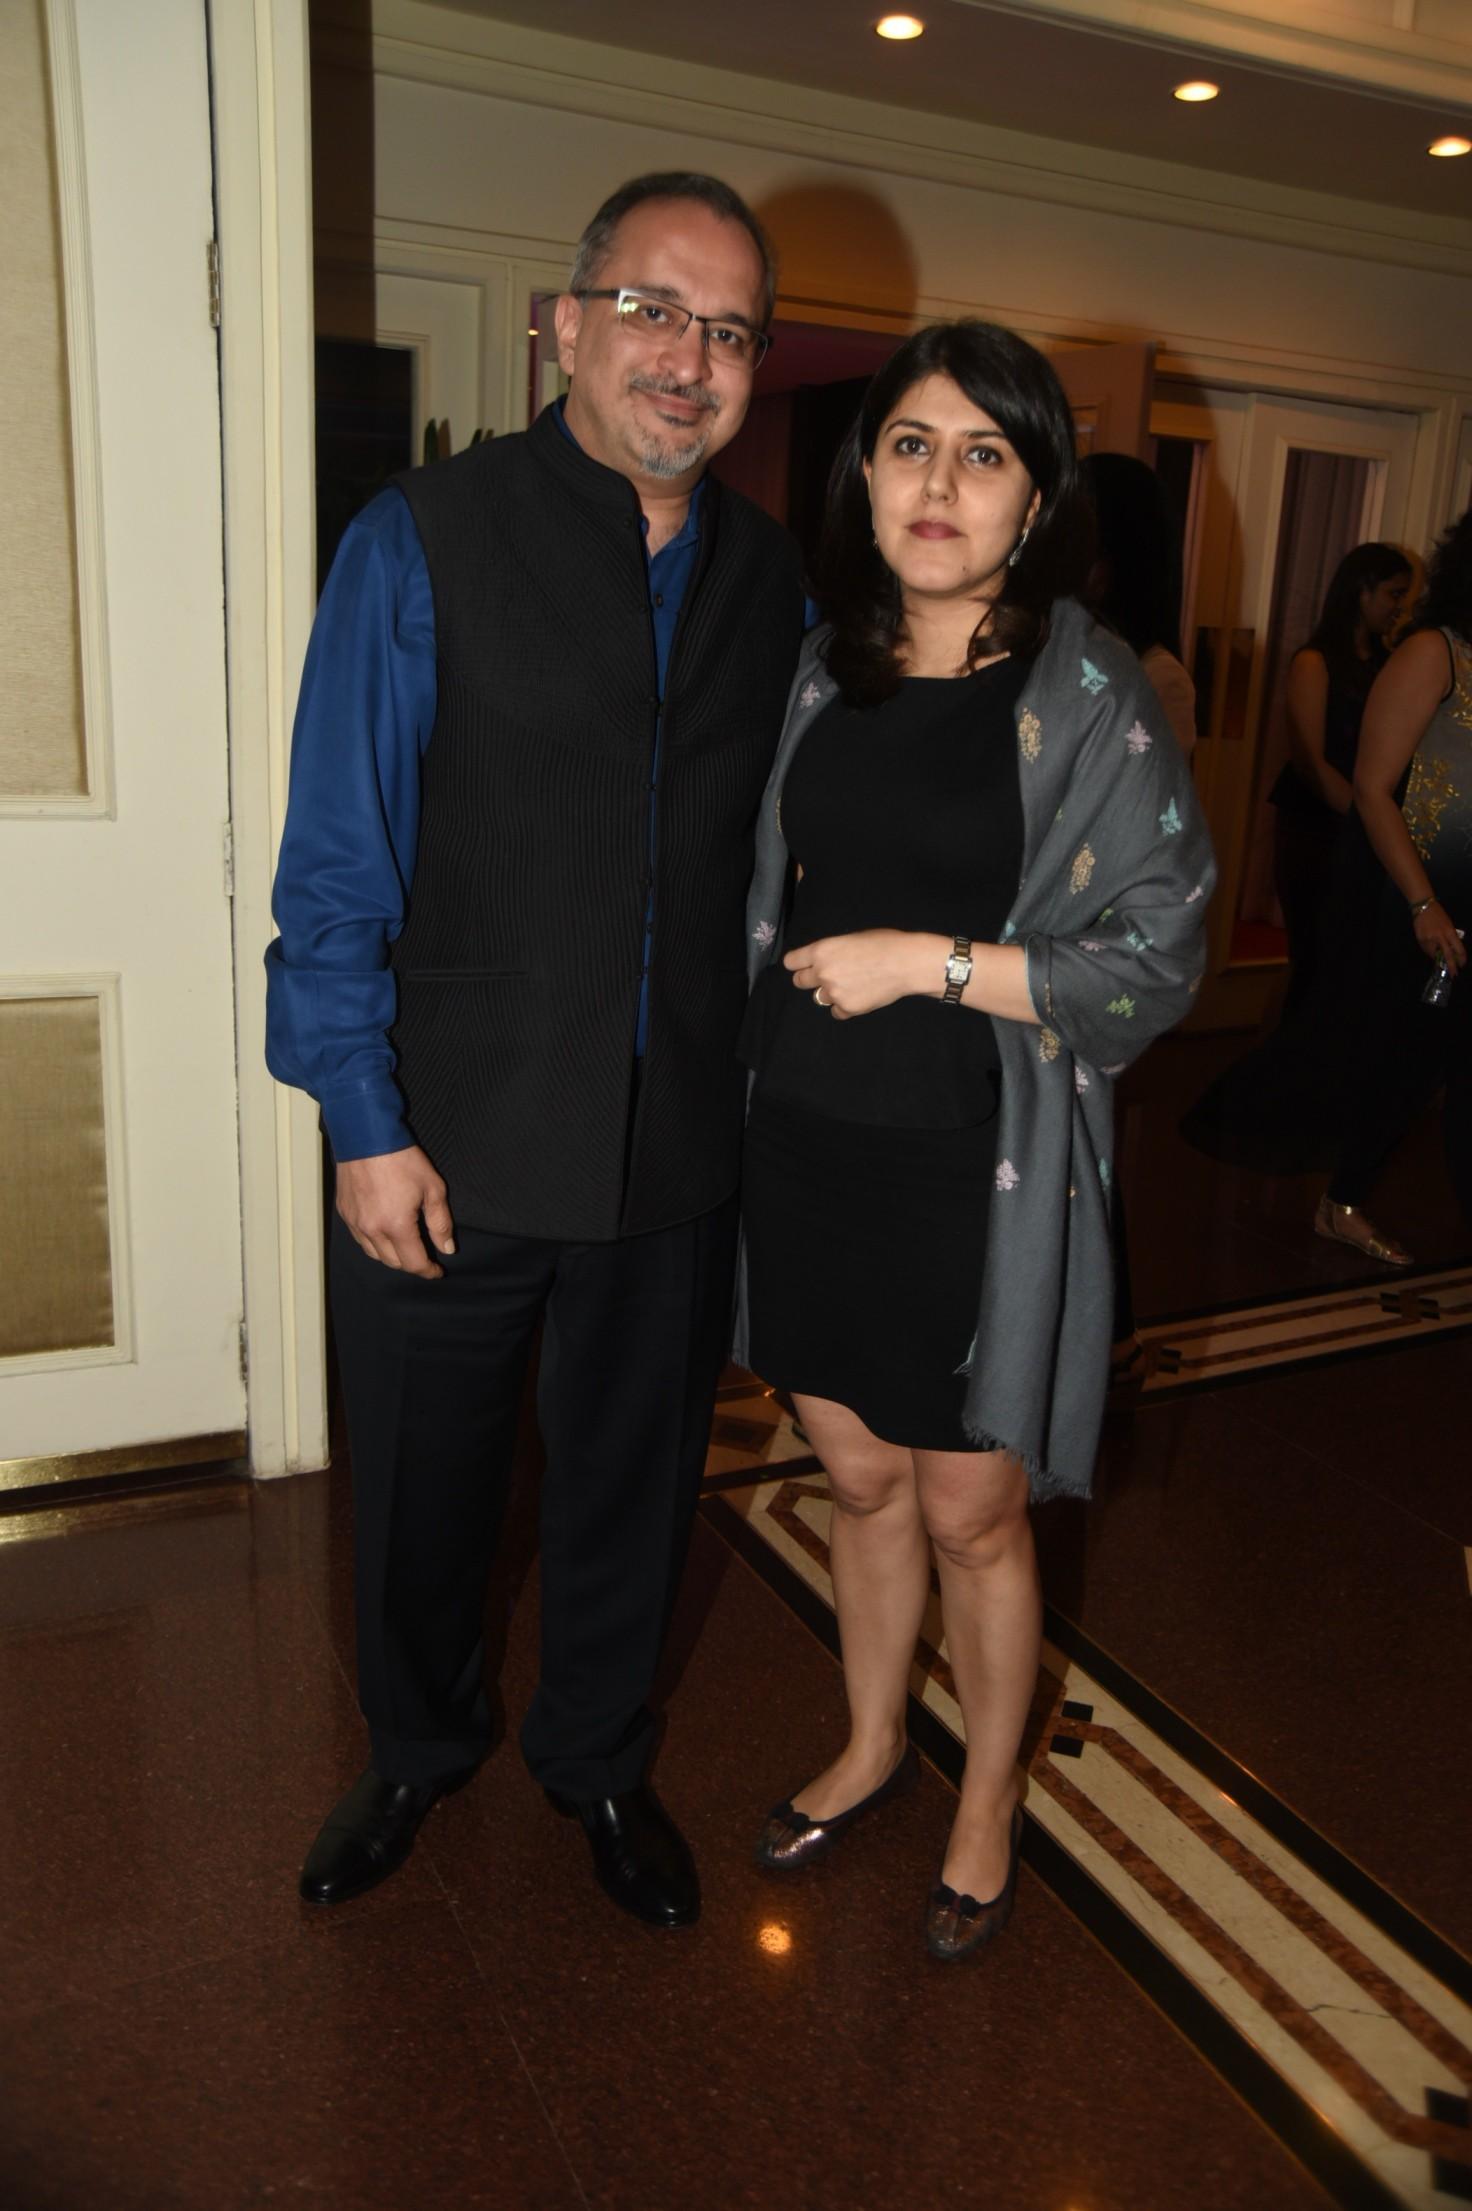 Dinesh and Meenal Vazirani